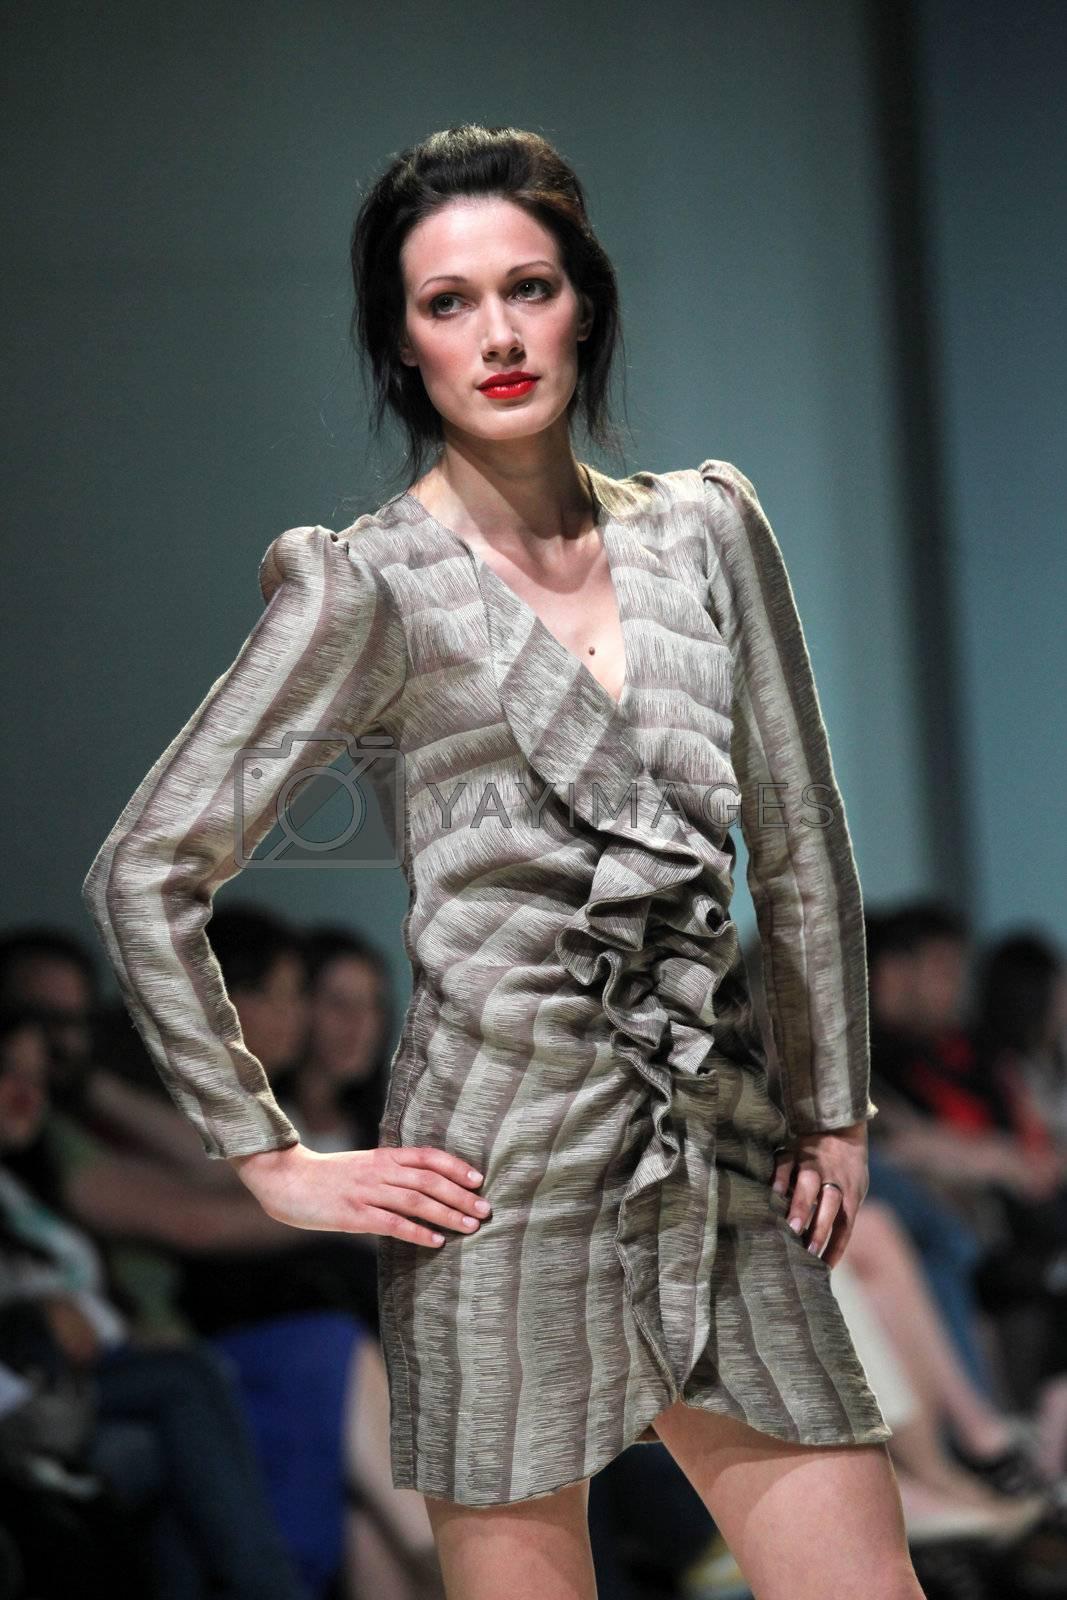 "ZAGREB, CROATIA - May 11: Fashion model wears clothes made by Natalija Smogur on ""ZAGREB FASHION WEEK"" show on May 11, 2012 in Zagreb, Croatia."